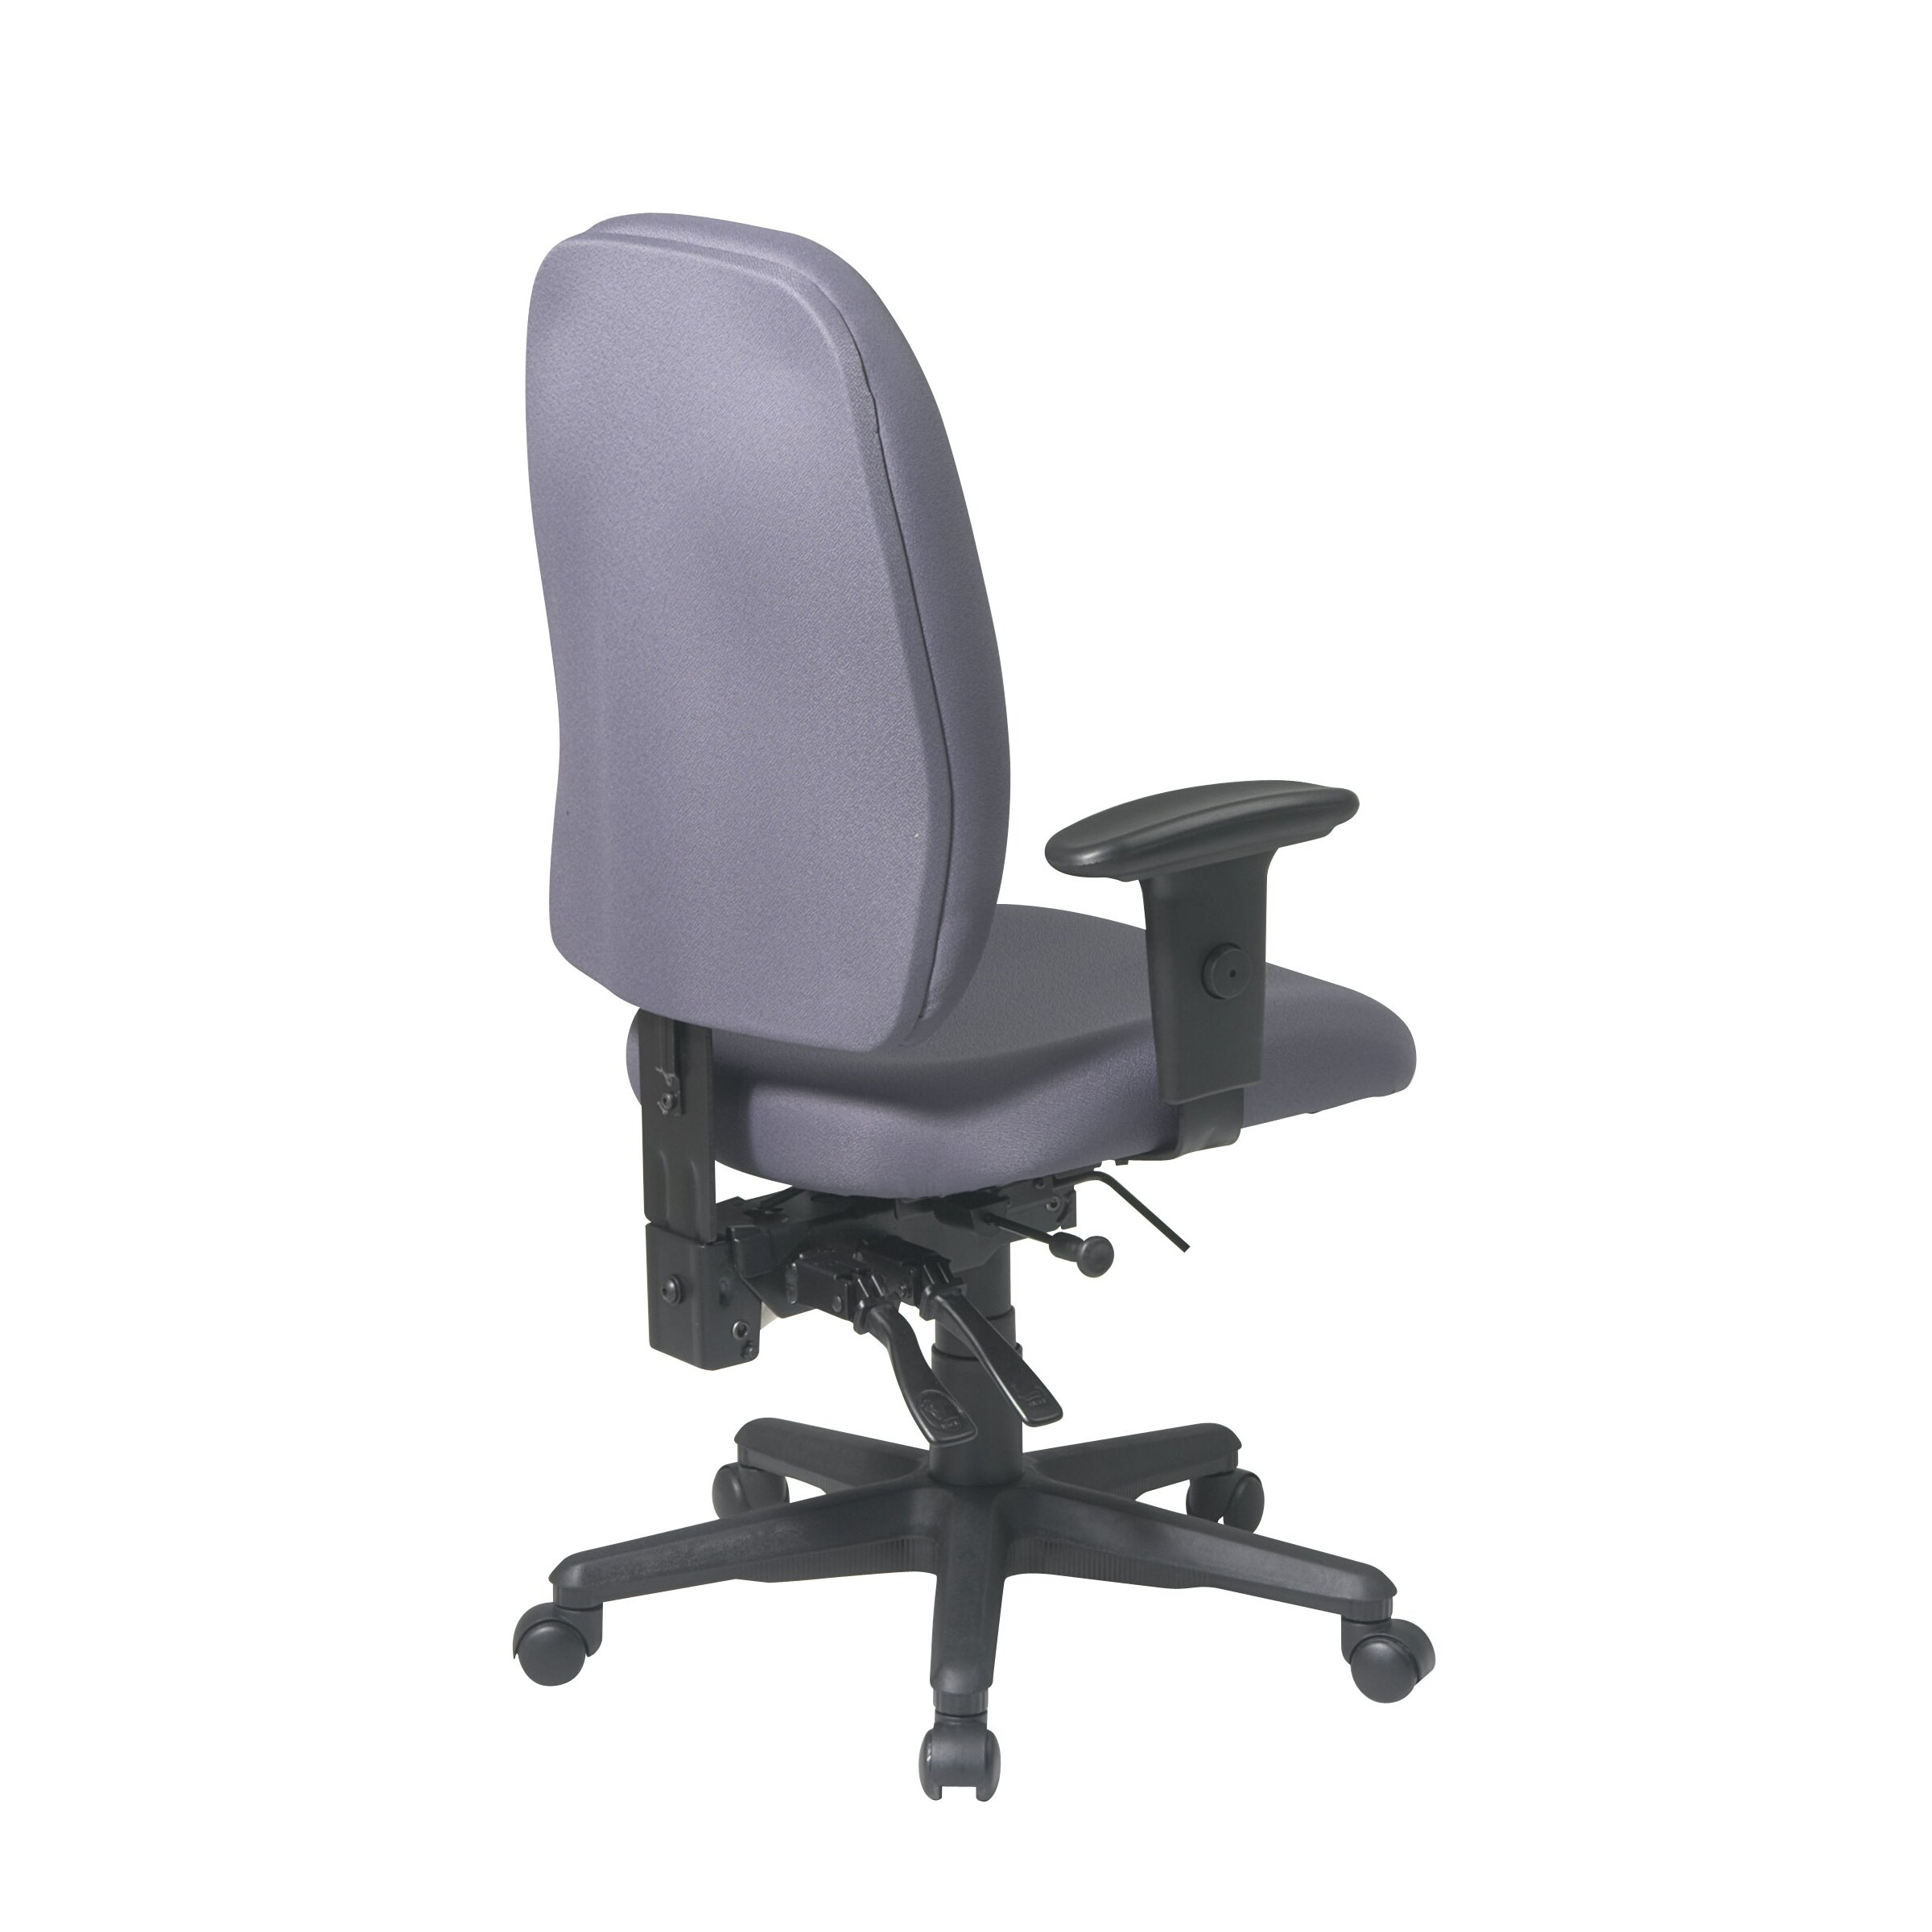 office ergonomic high back desk chair reviews